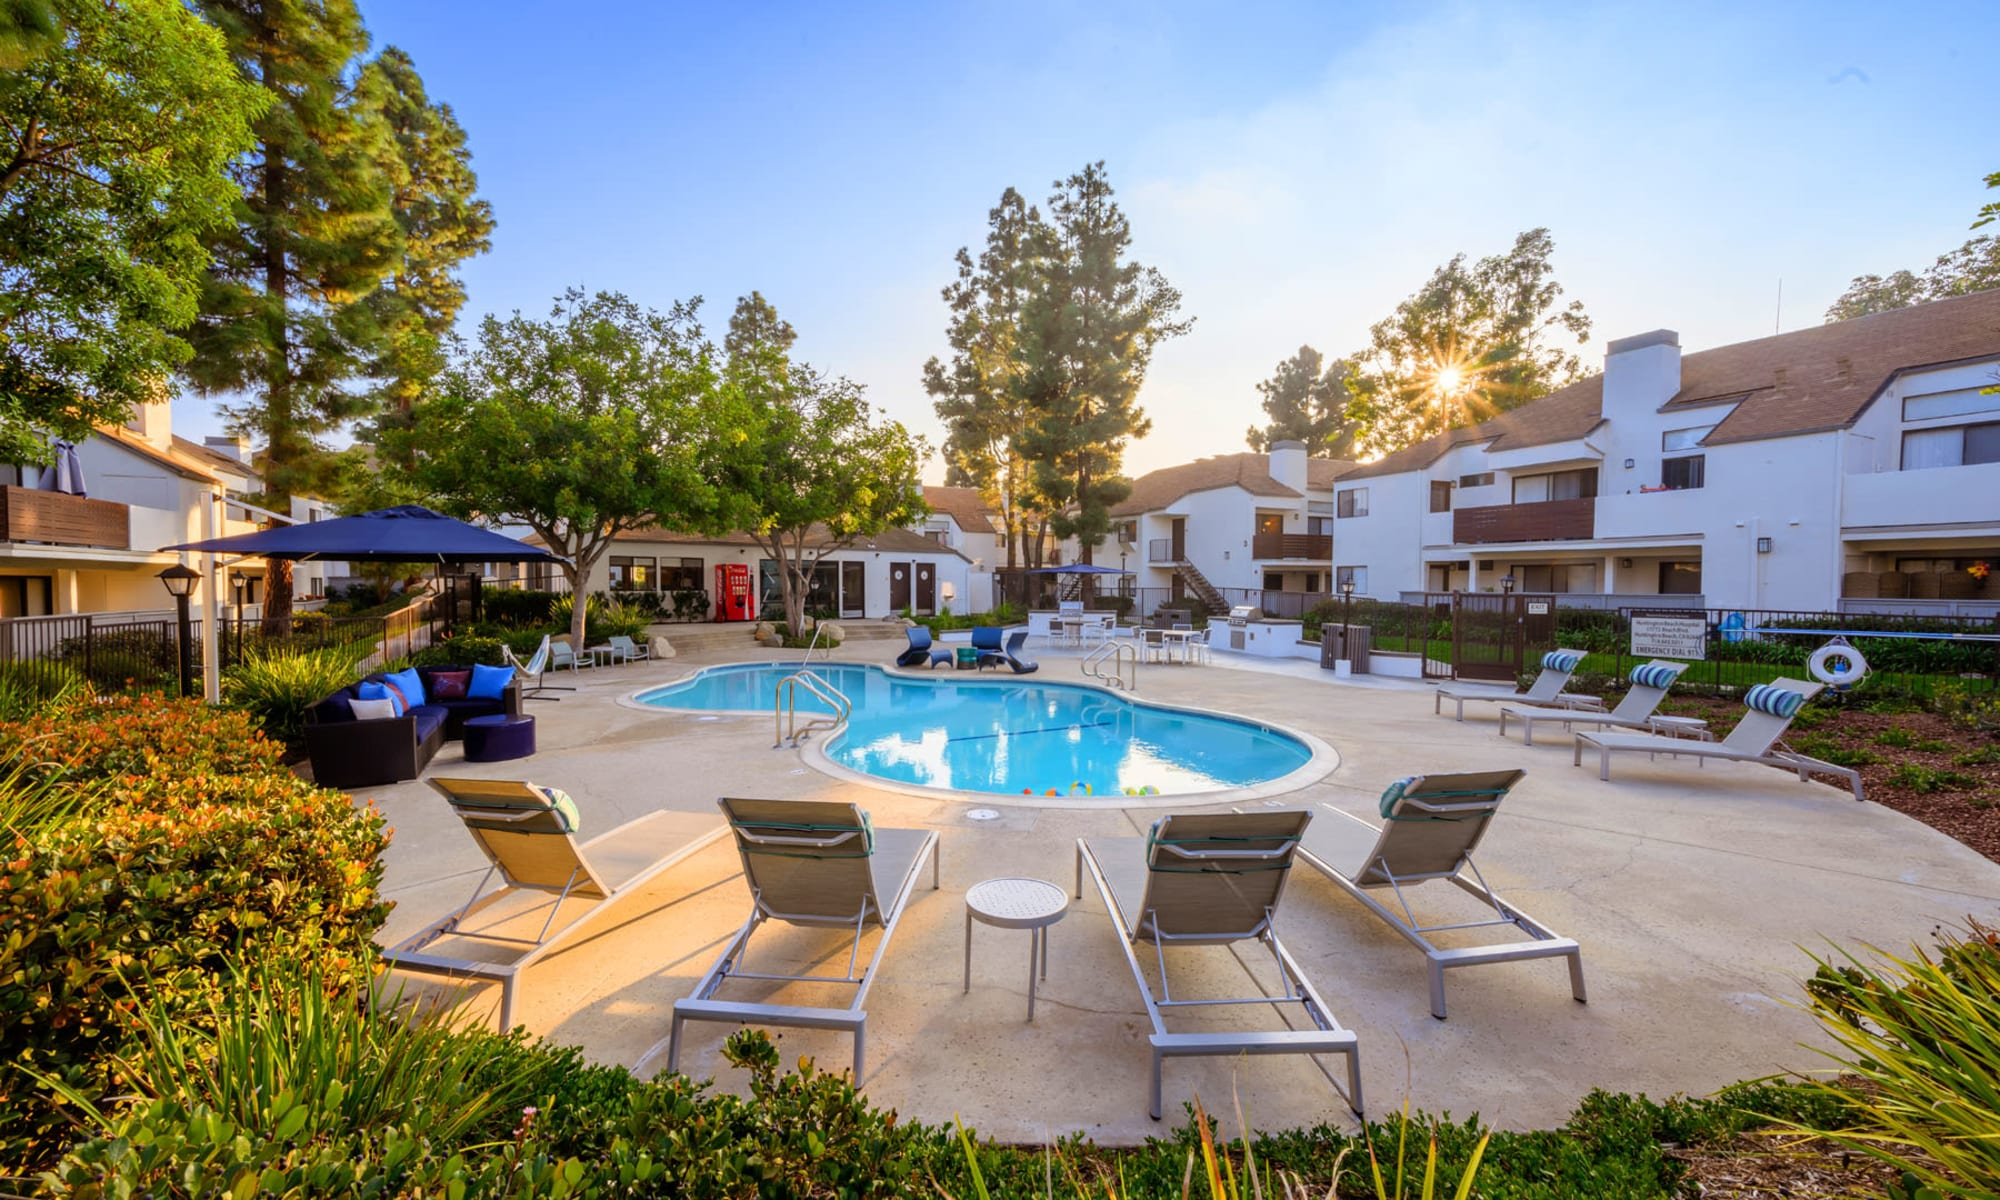 Sunlight streaming through the trees above the pool area just before sunset at Sendero Huntington Beach in Huntington Beach, California